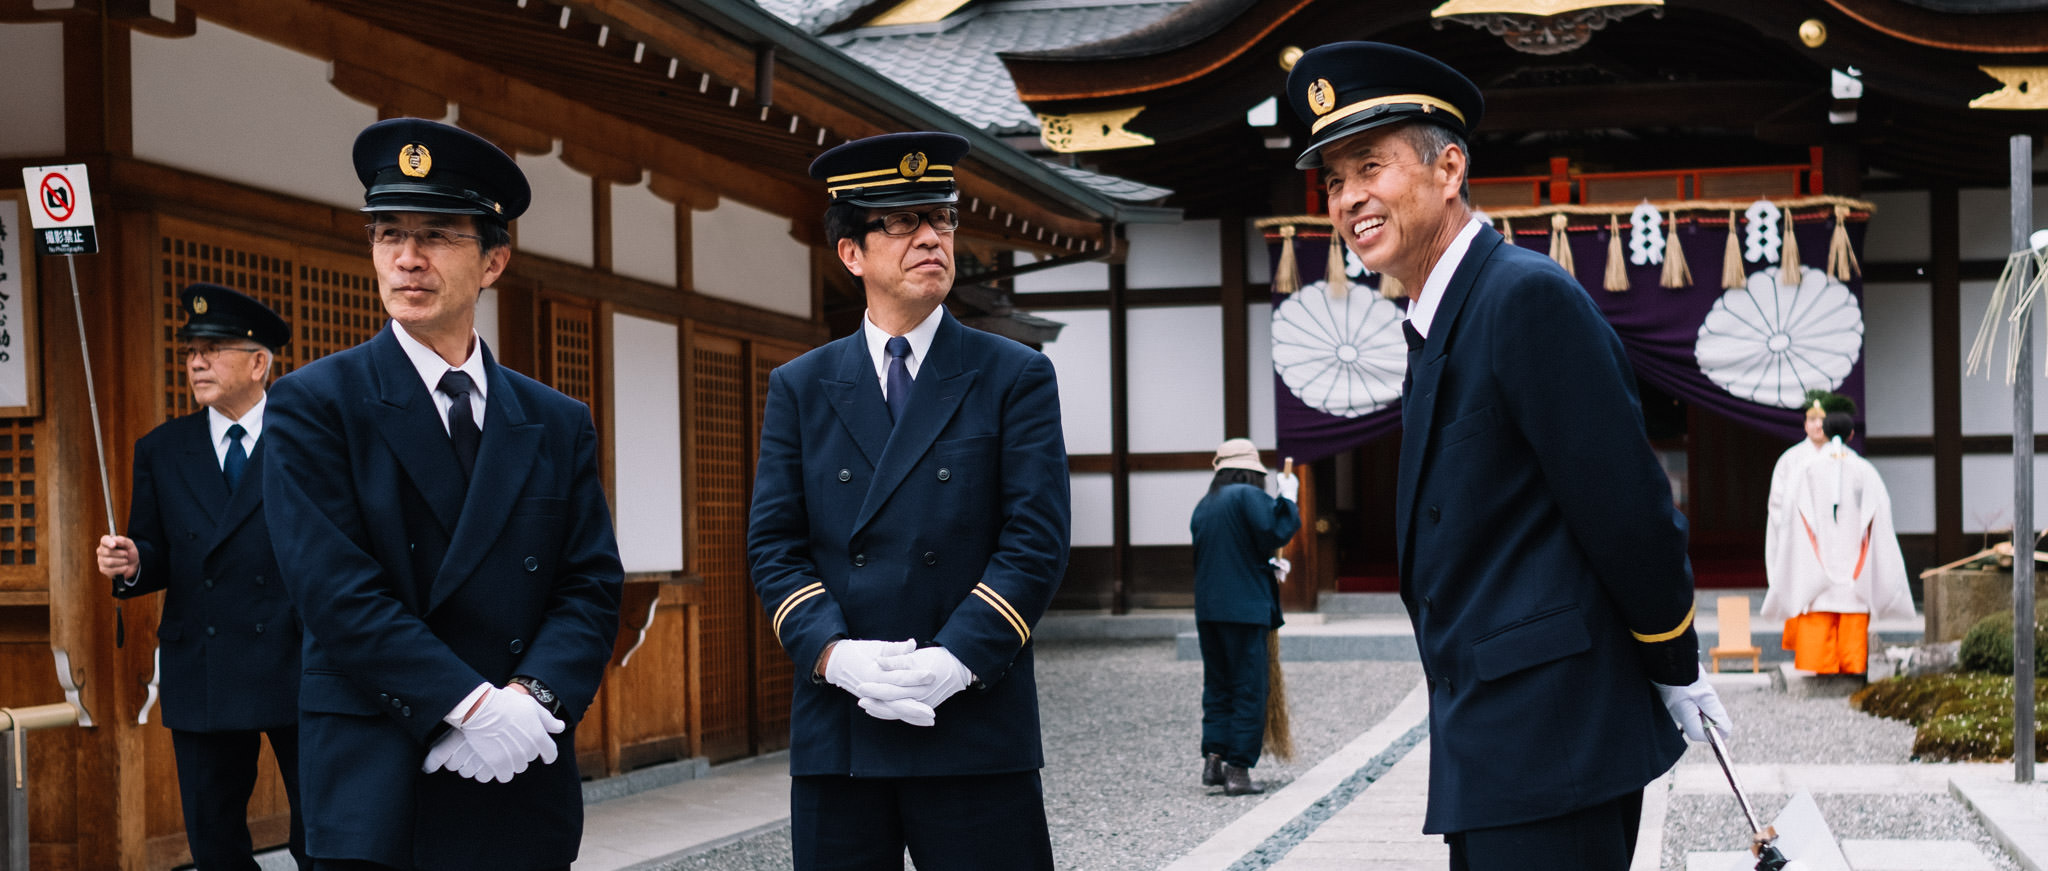 chris_eberhardt_japan_travel_reise_nippon-47.jpg